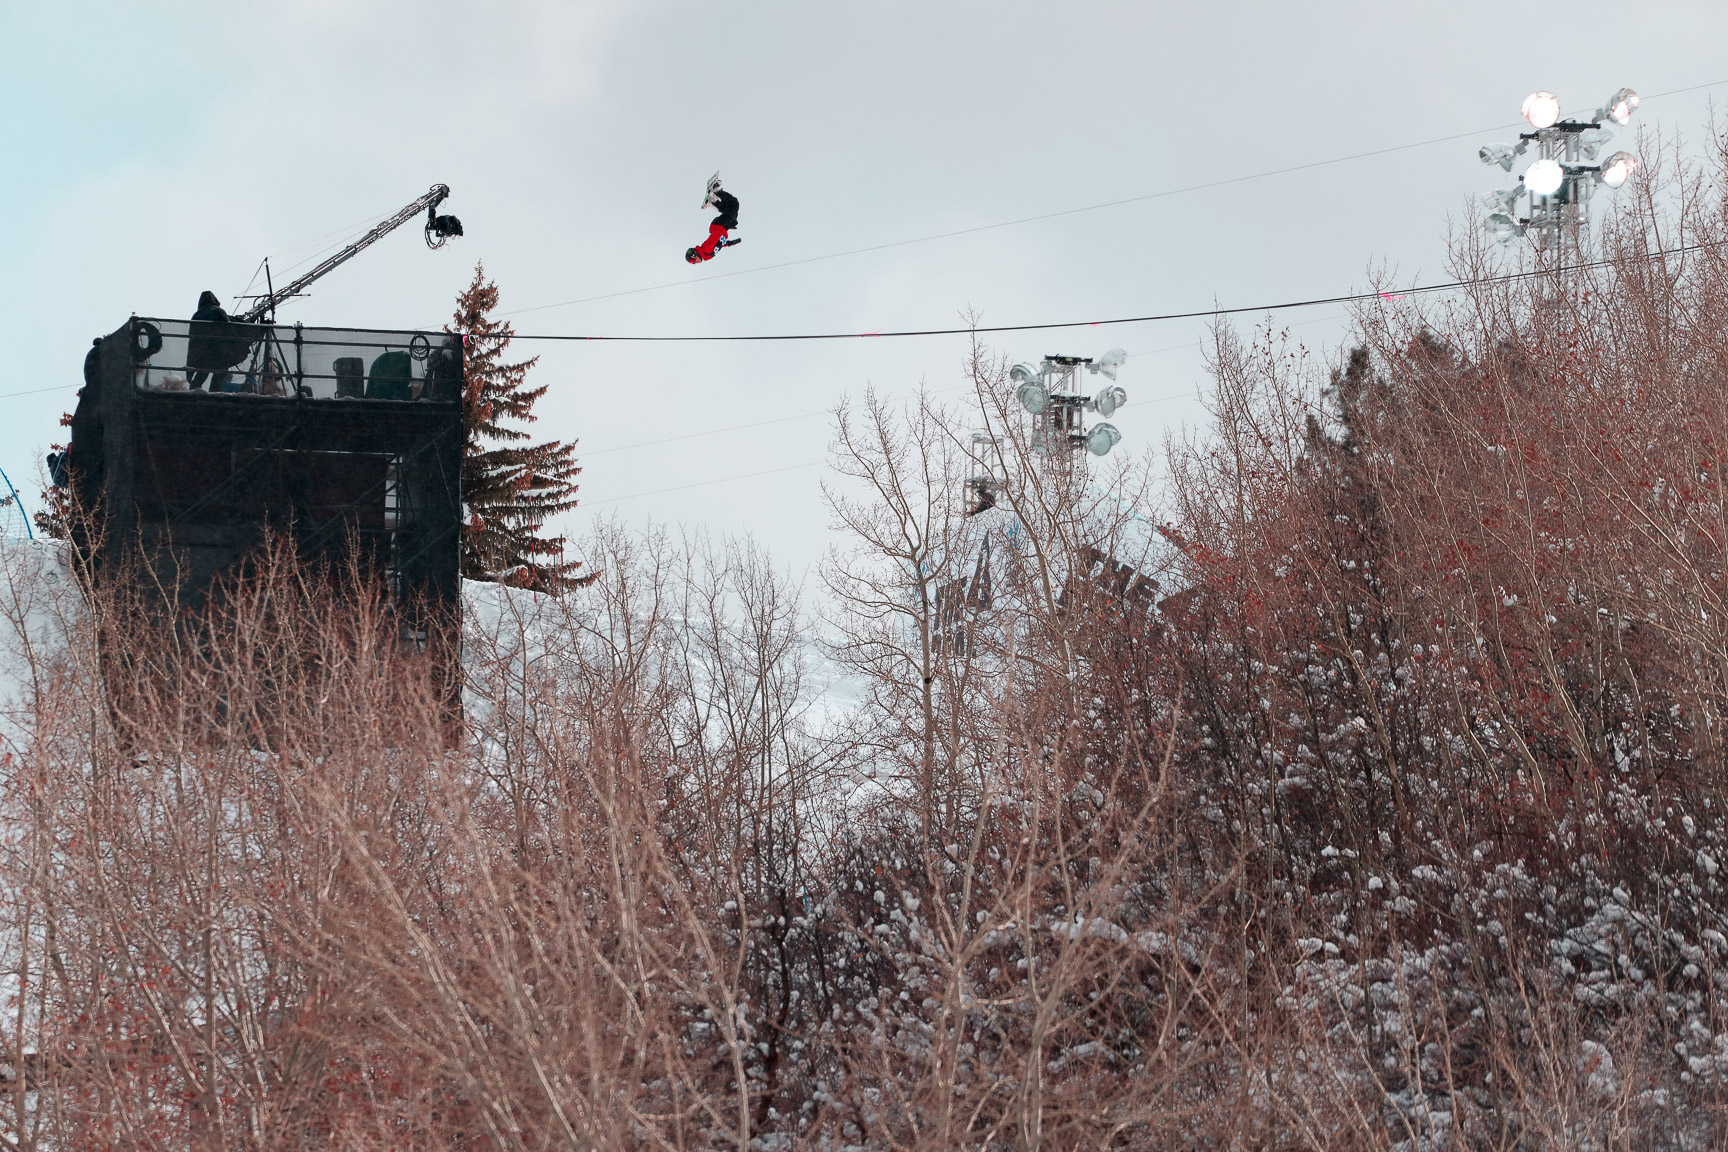 Rene Rinnekangas, Snowboard Big Air Elimination